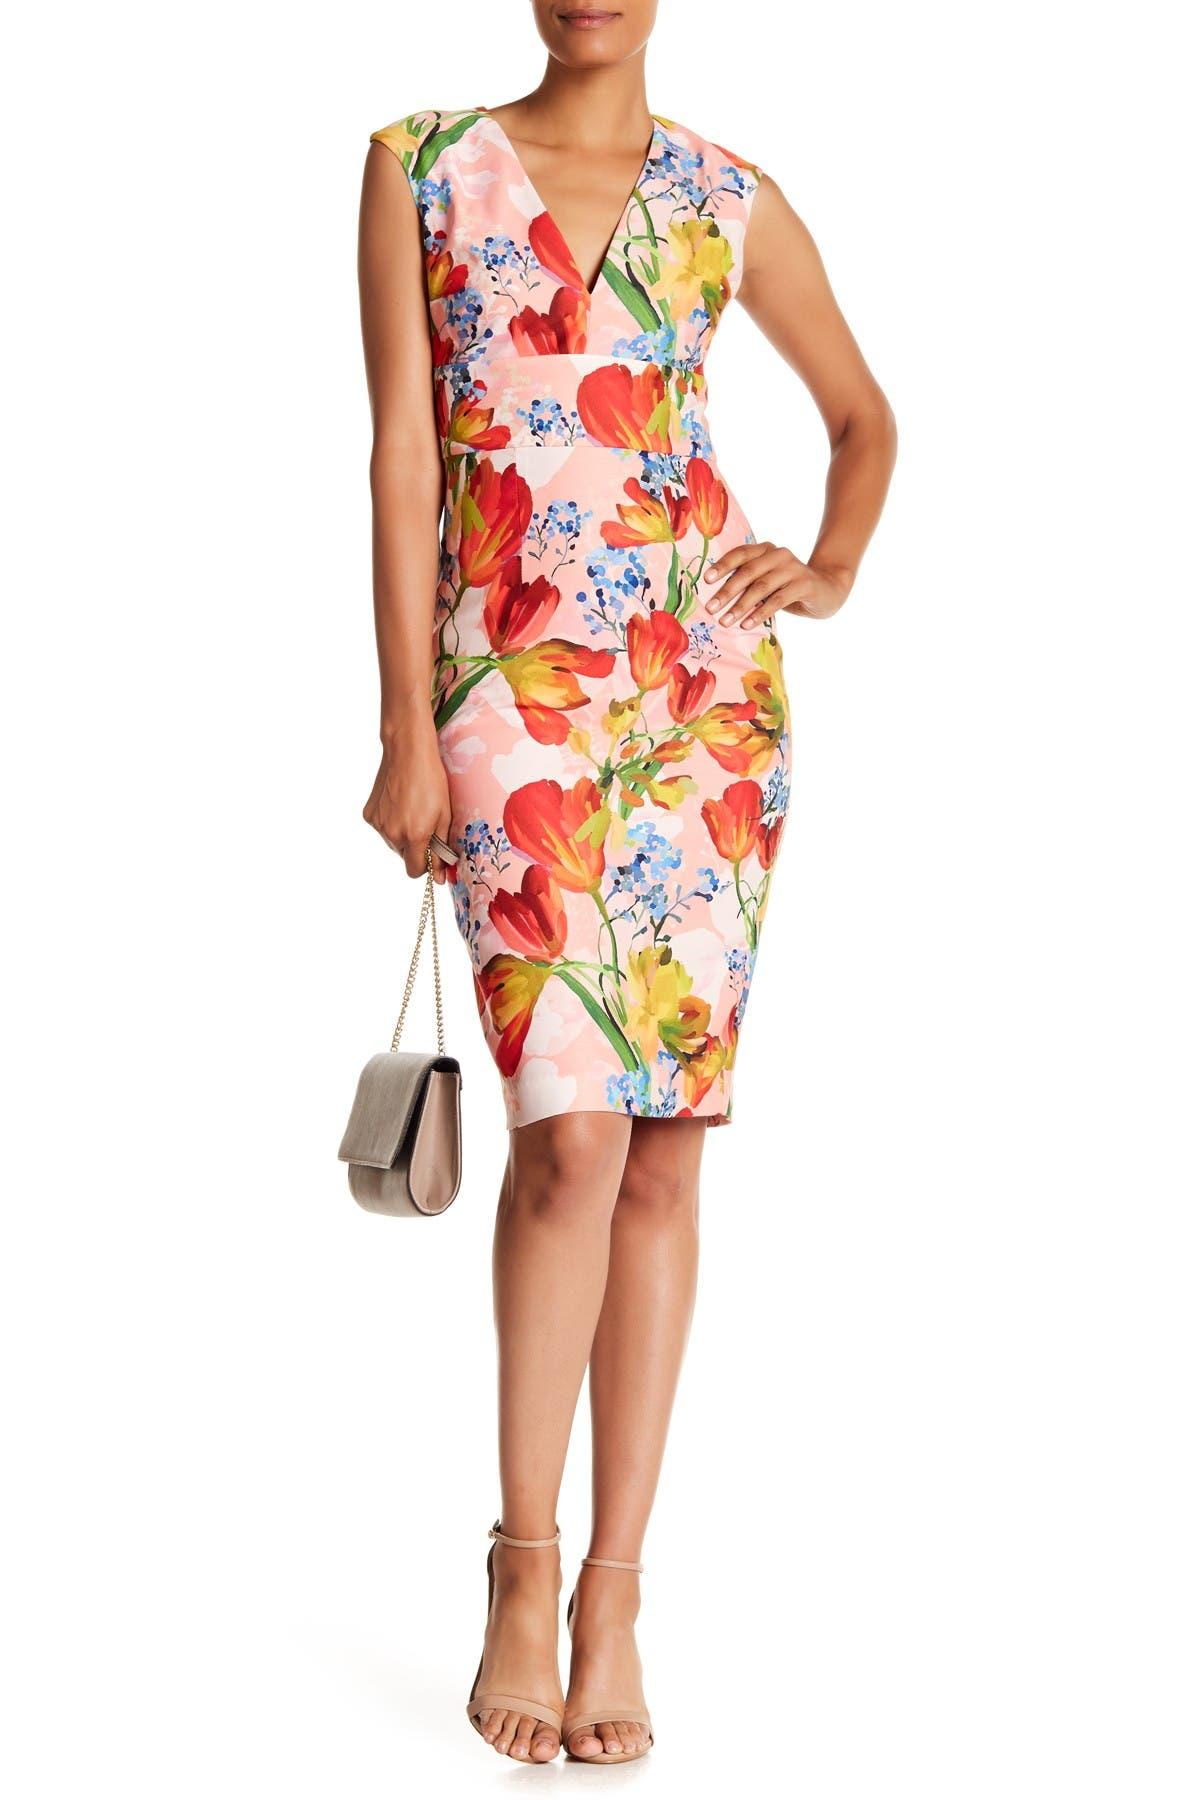 Image of Kay Unger Mixed Floral Print V-Neck Dress